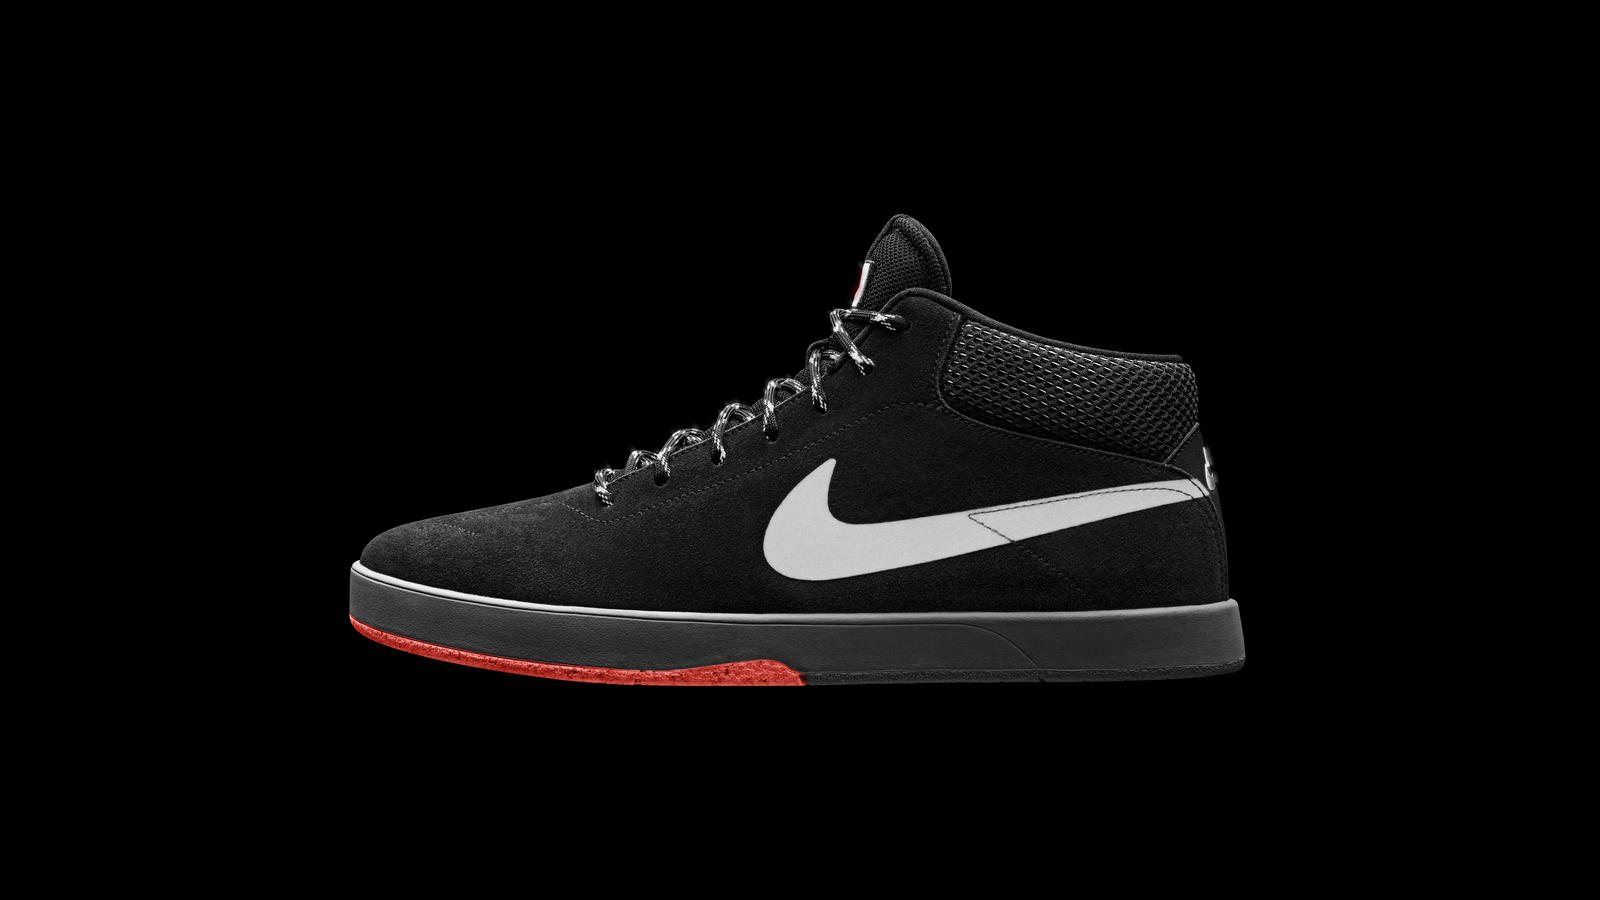 vocal Dibuja una imagen Conciliar  Fight The Night: Nike SB Flash Pack - Nike News